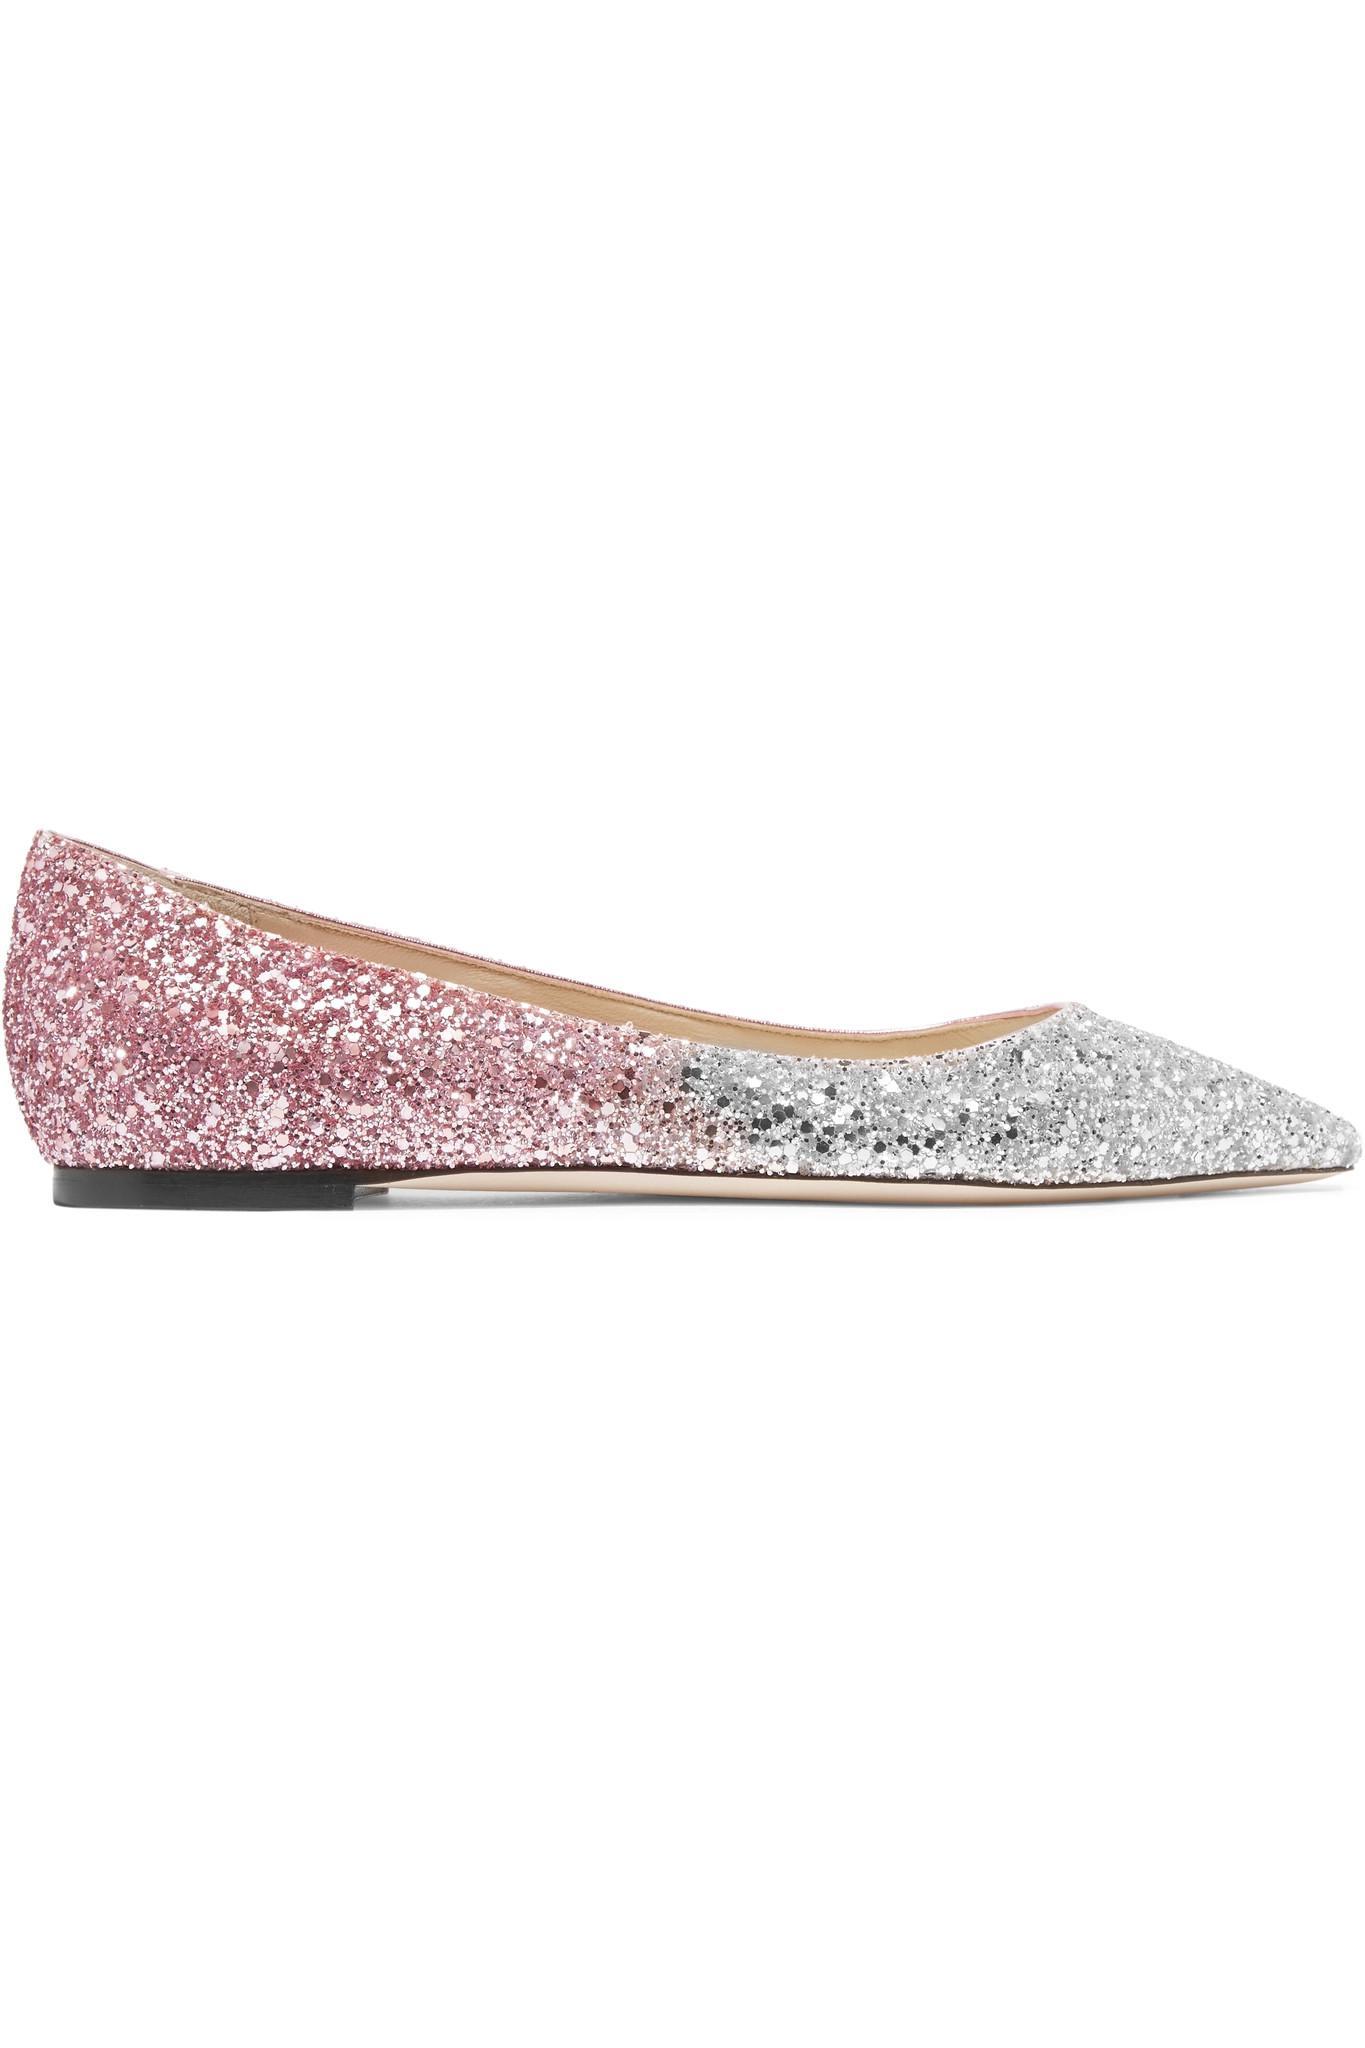 Jimmy Choo. Women's Romy Degradé Glittered Leather Point-toe Flats